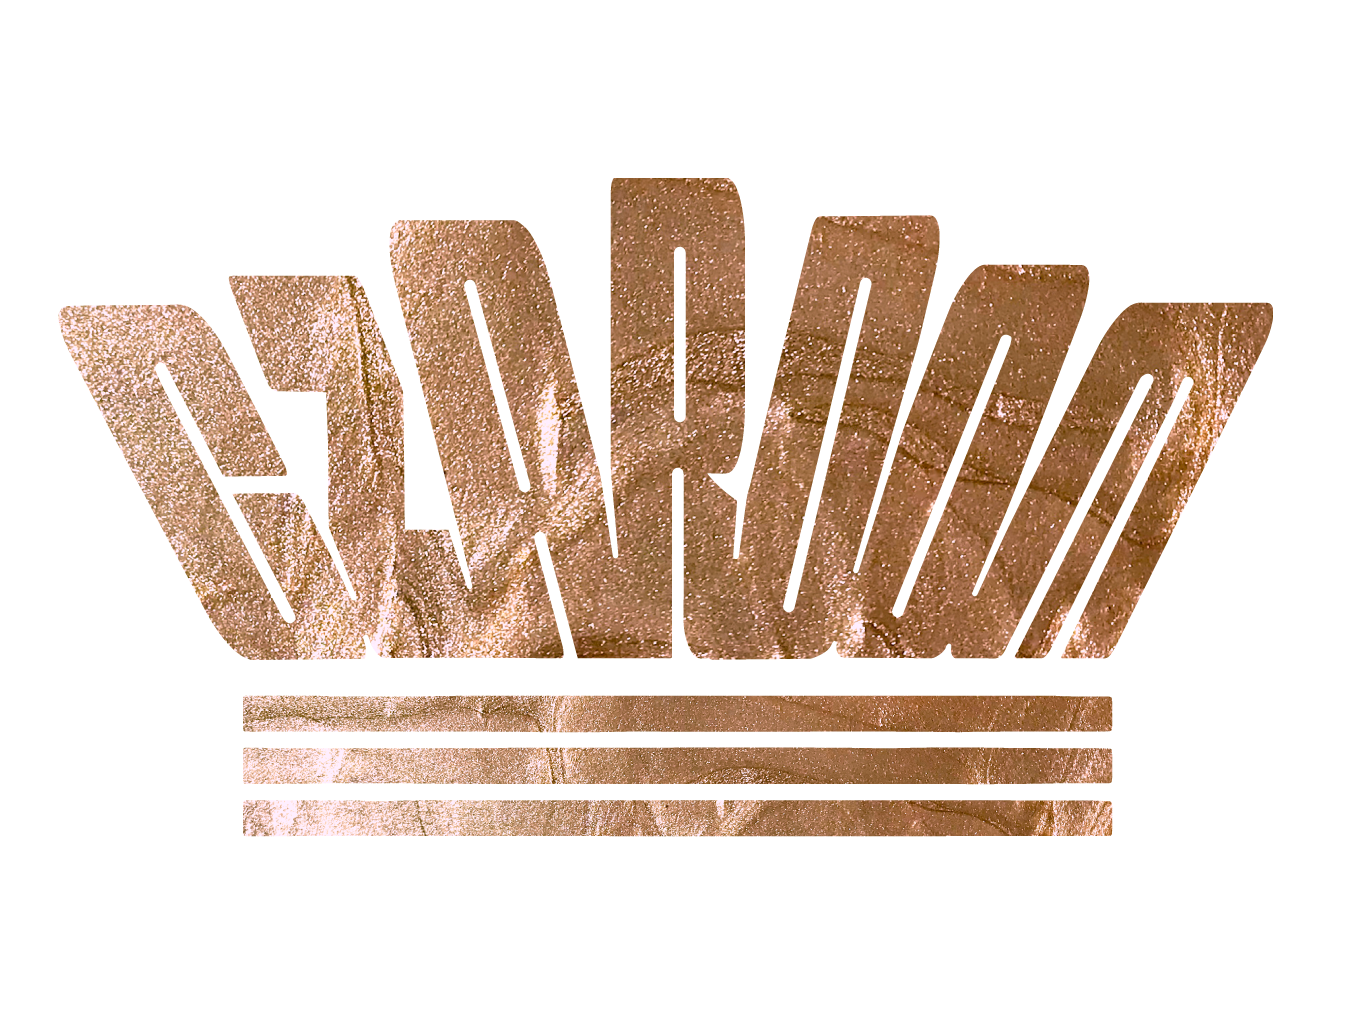 Czardom rose gold crown design logo